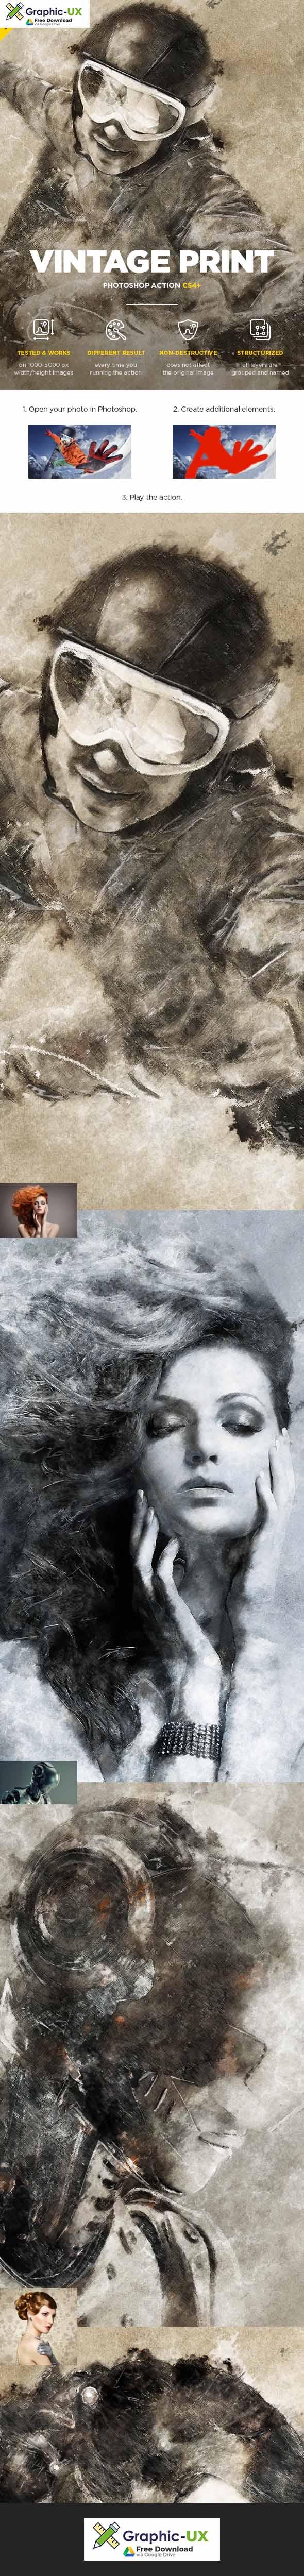 Vintage Print CS4+ Photoshop Action